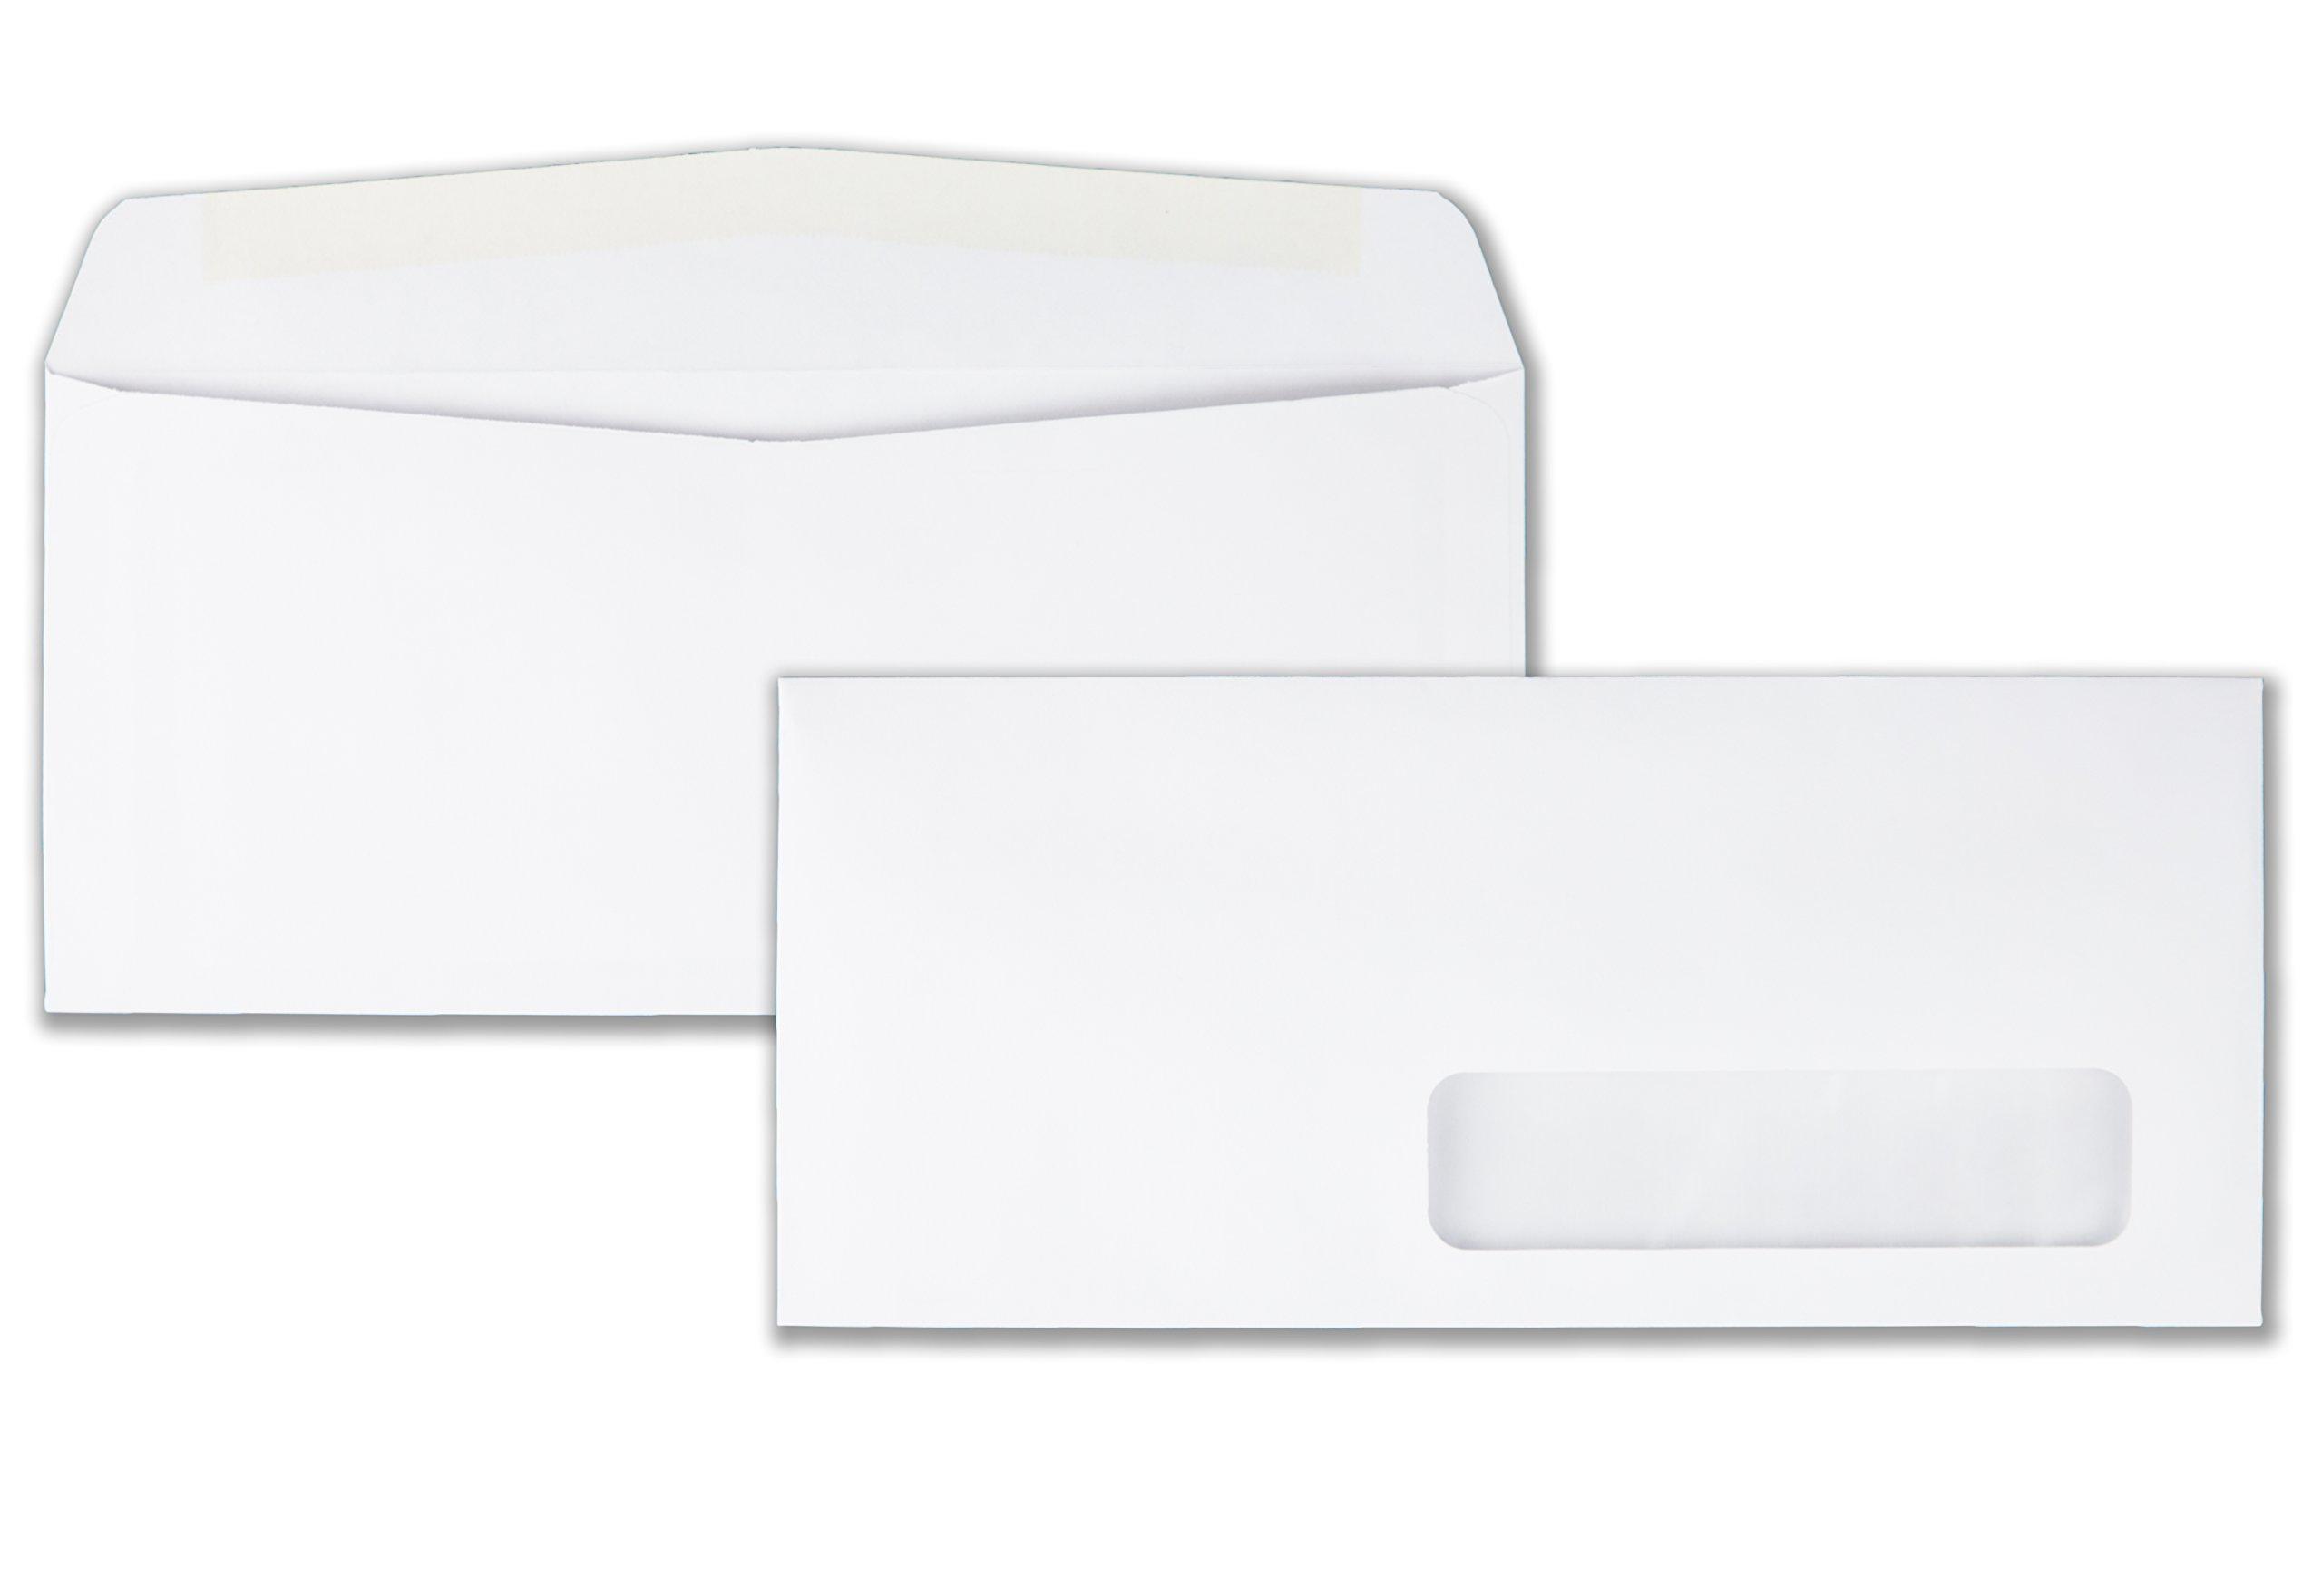 Quality Park 21332 Quality Park Right-Window Envelopes, 10, 24lb, White, 500/Box